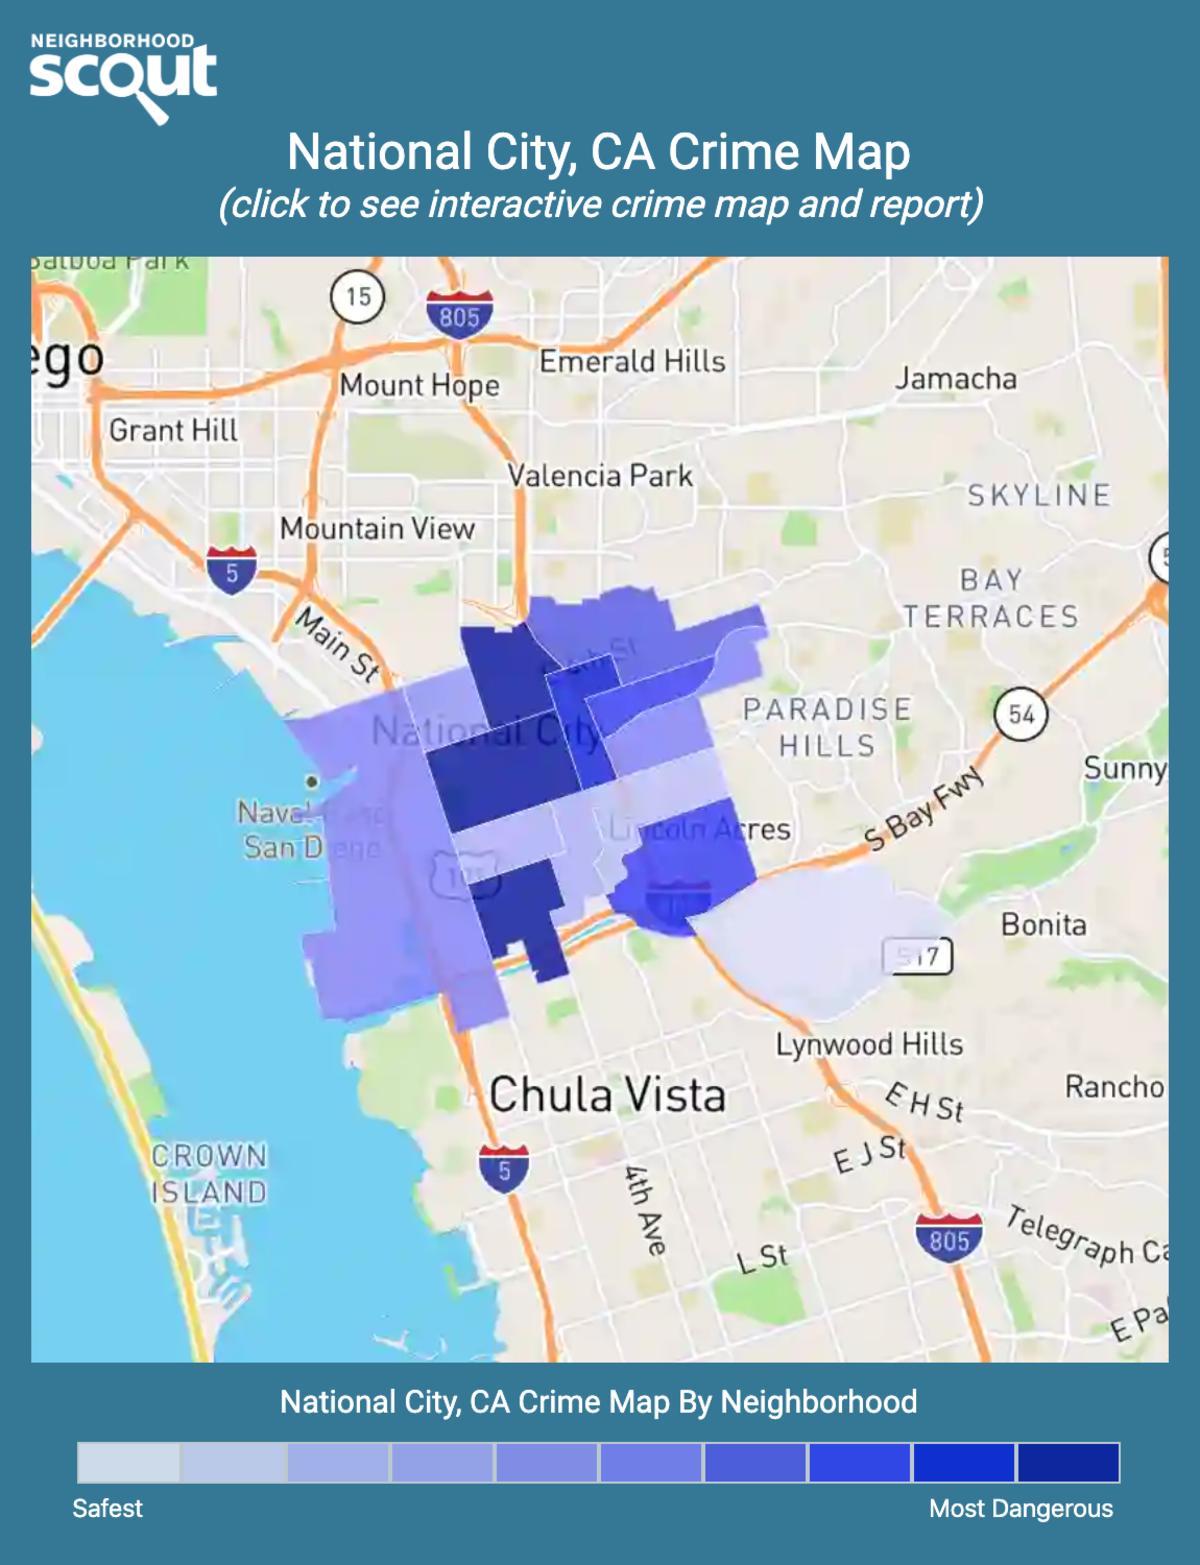 National City, California crime map